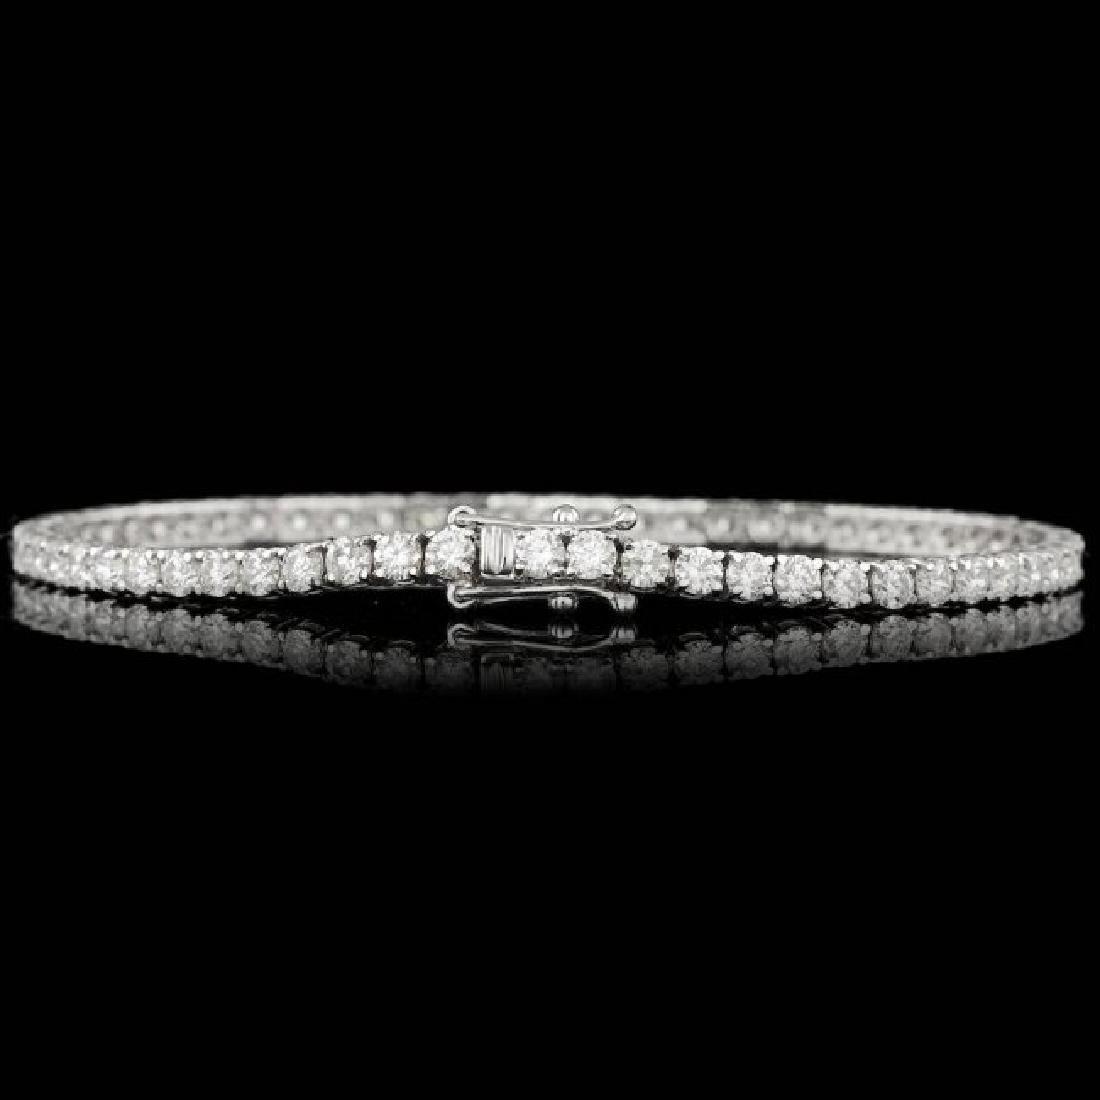 18k White Gold 5.30ct Diamond Bracelet - 3